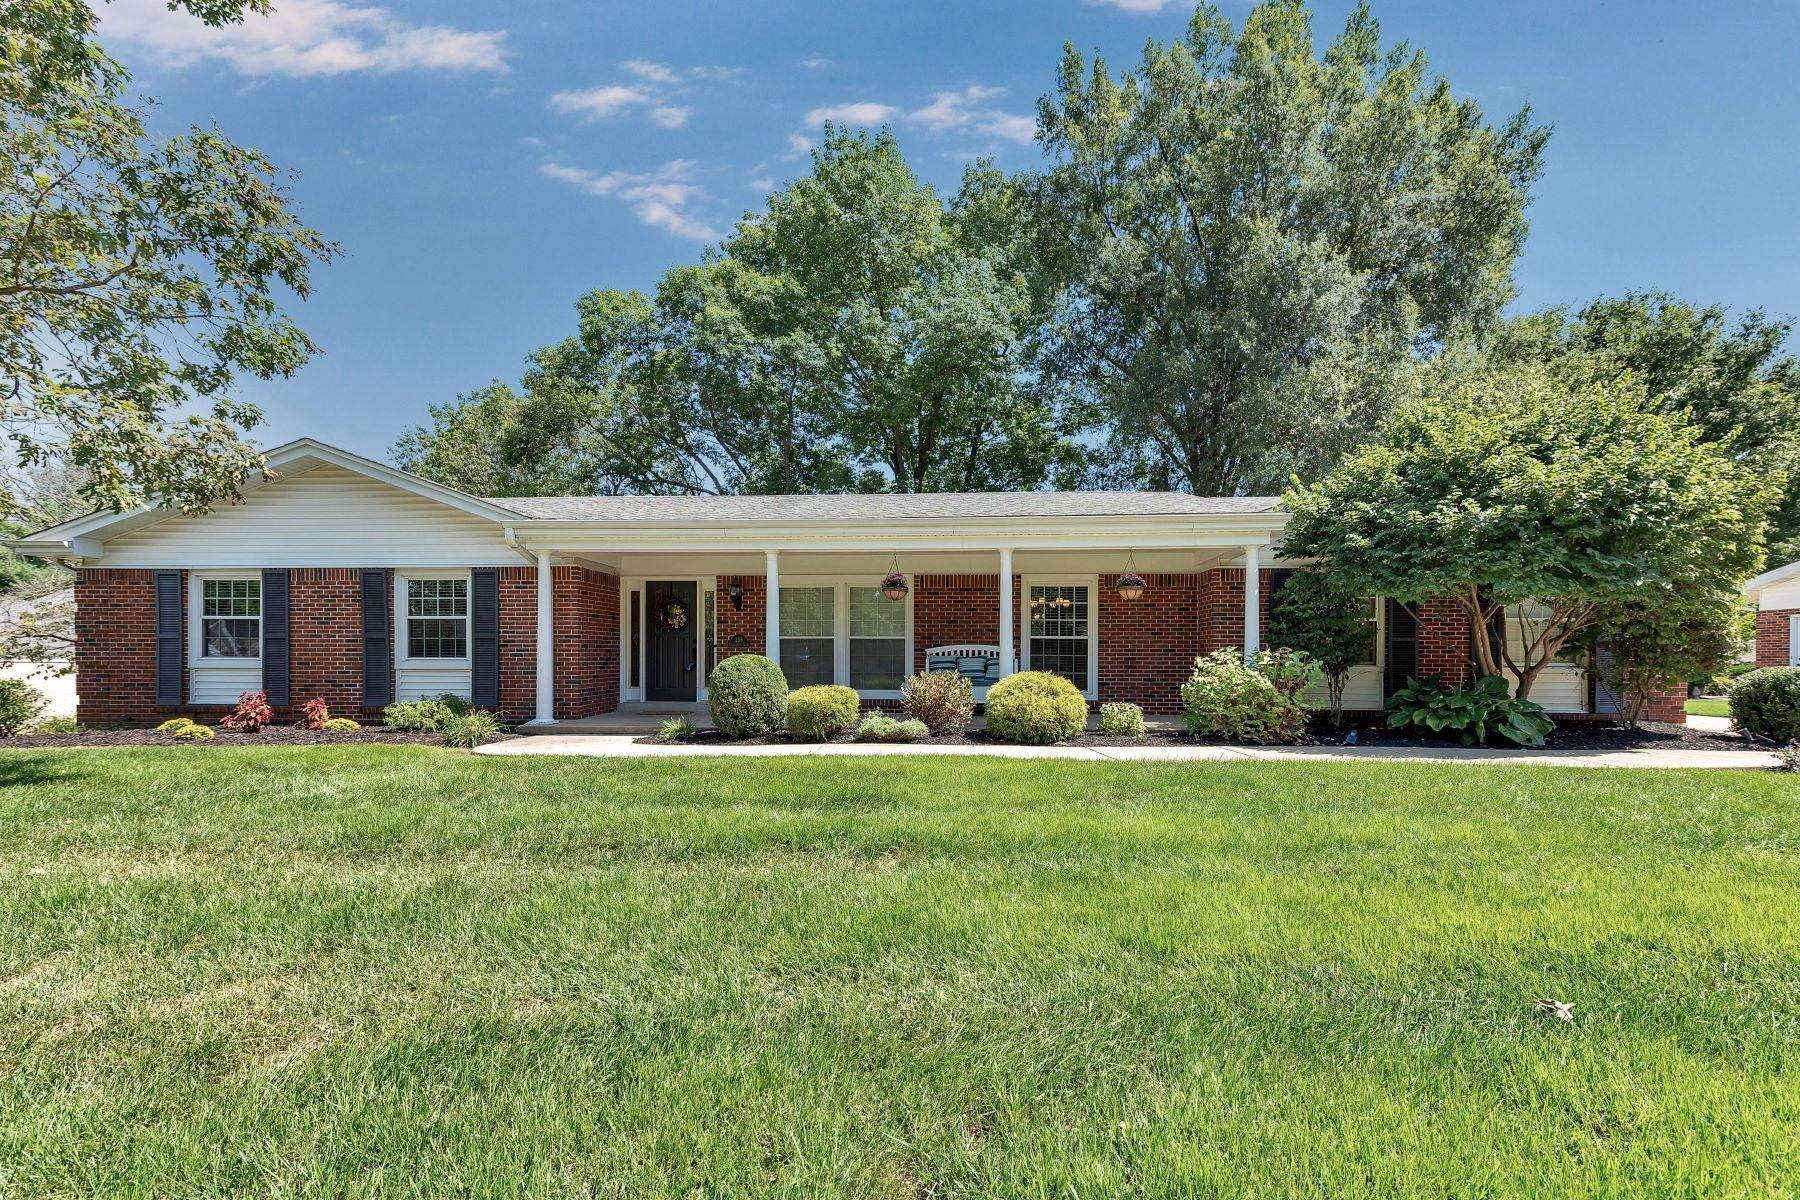 Single Family Homes για την Πώληση στο Charming Chesterfield Ranch 296 Chateaugay Lane, Chesterfield, Μιζουρι 63017 Ηνωμένες Πολιτείες